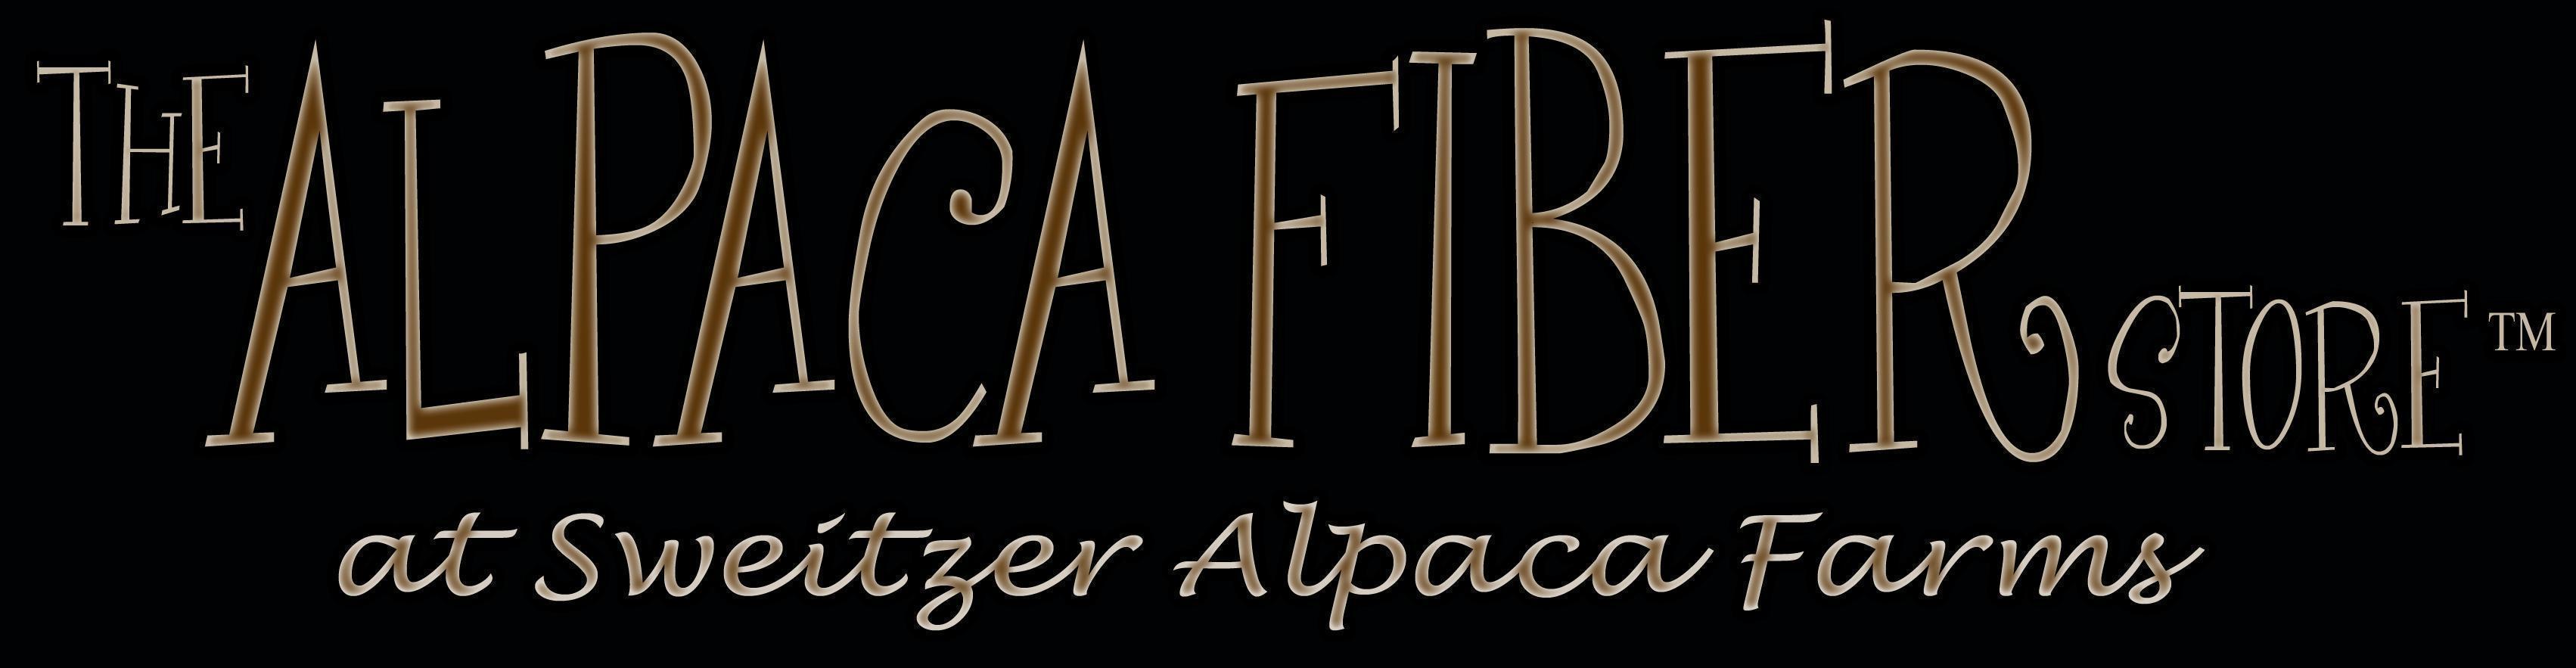 The Alpaca Fiber Store Fiberstore